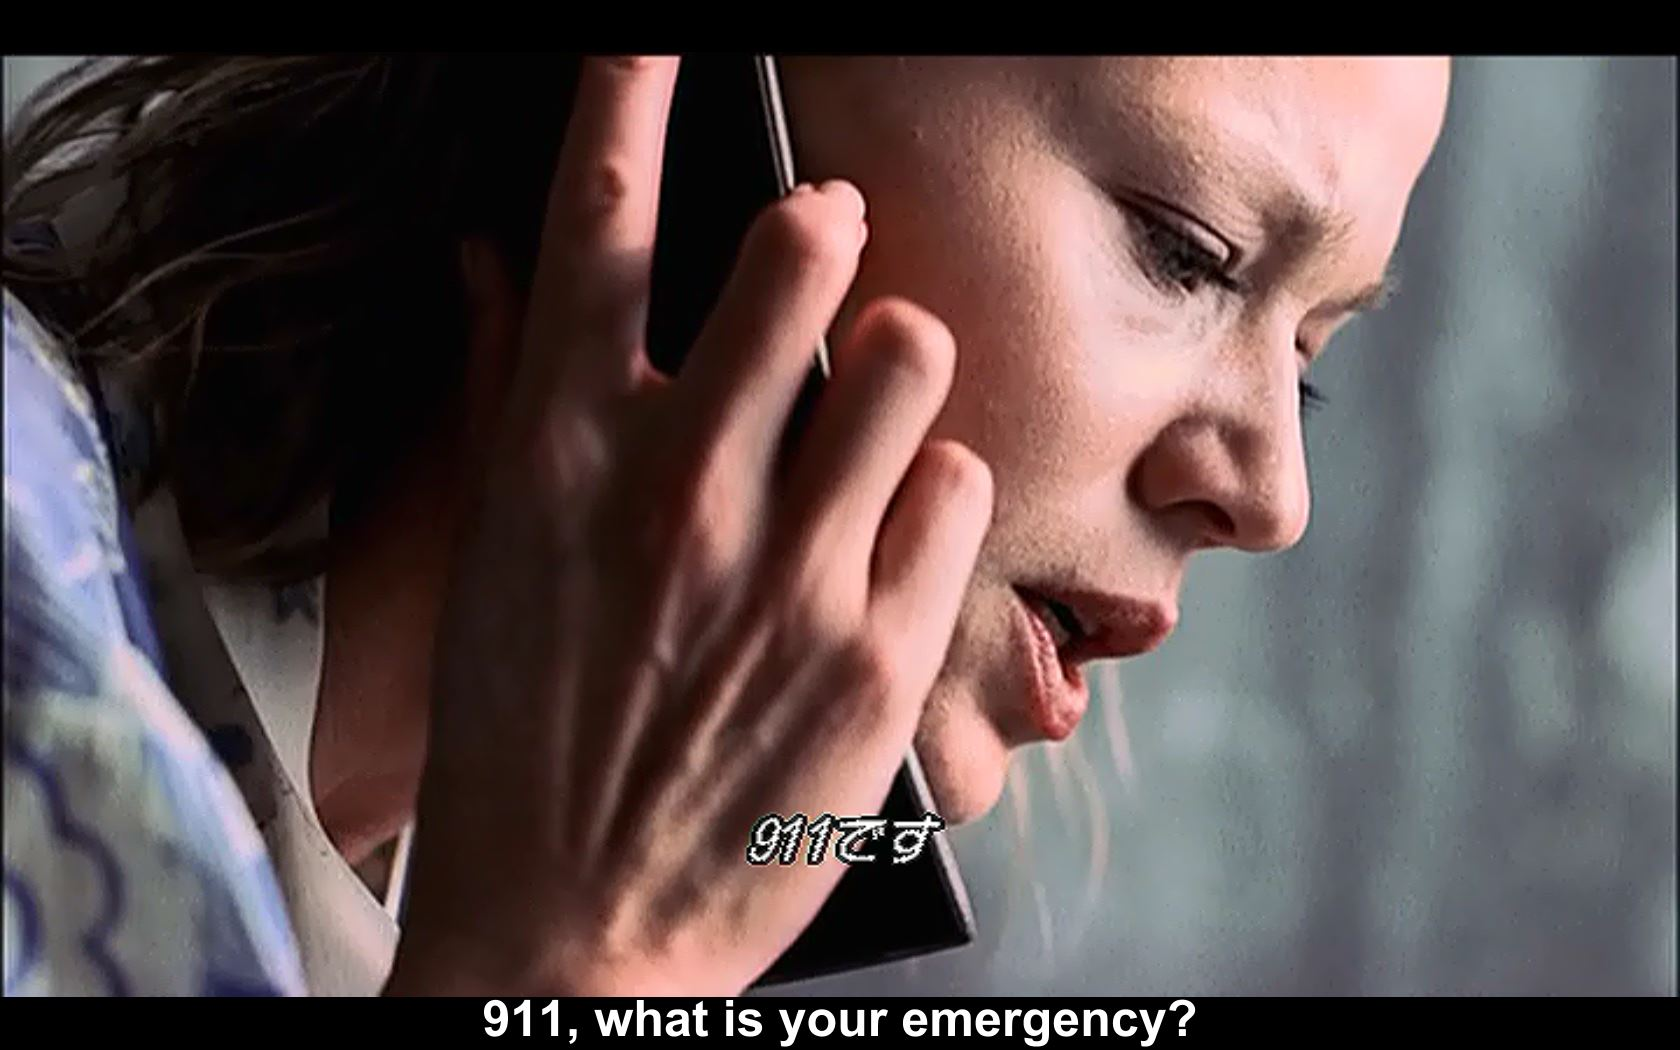 「Dr. HOUSE」シーズン2の第15話(emergencyほか)